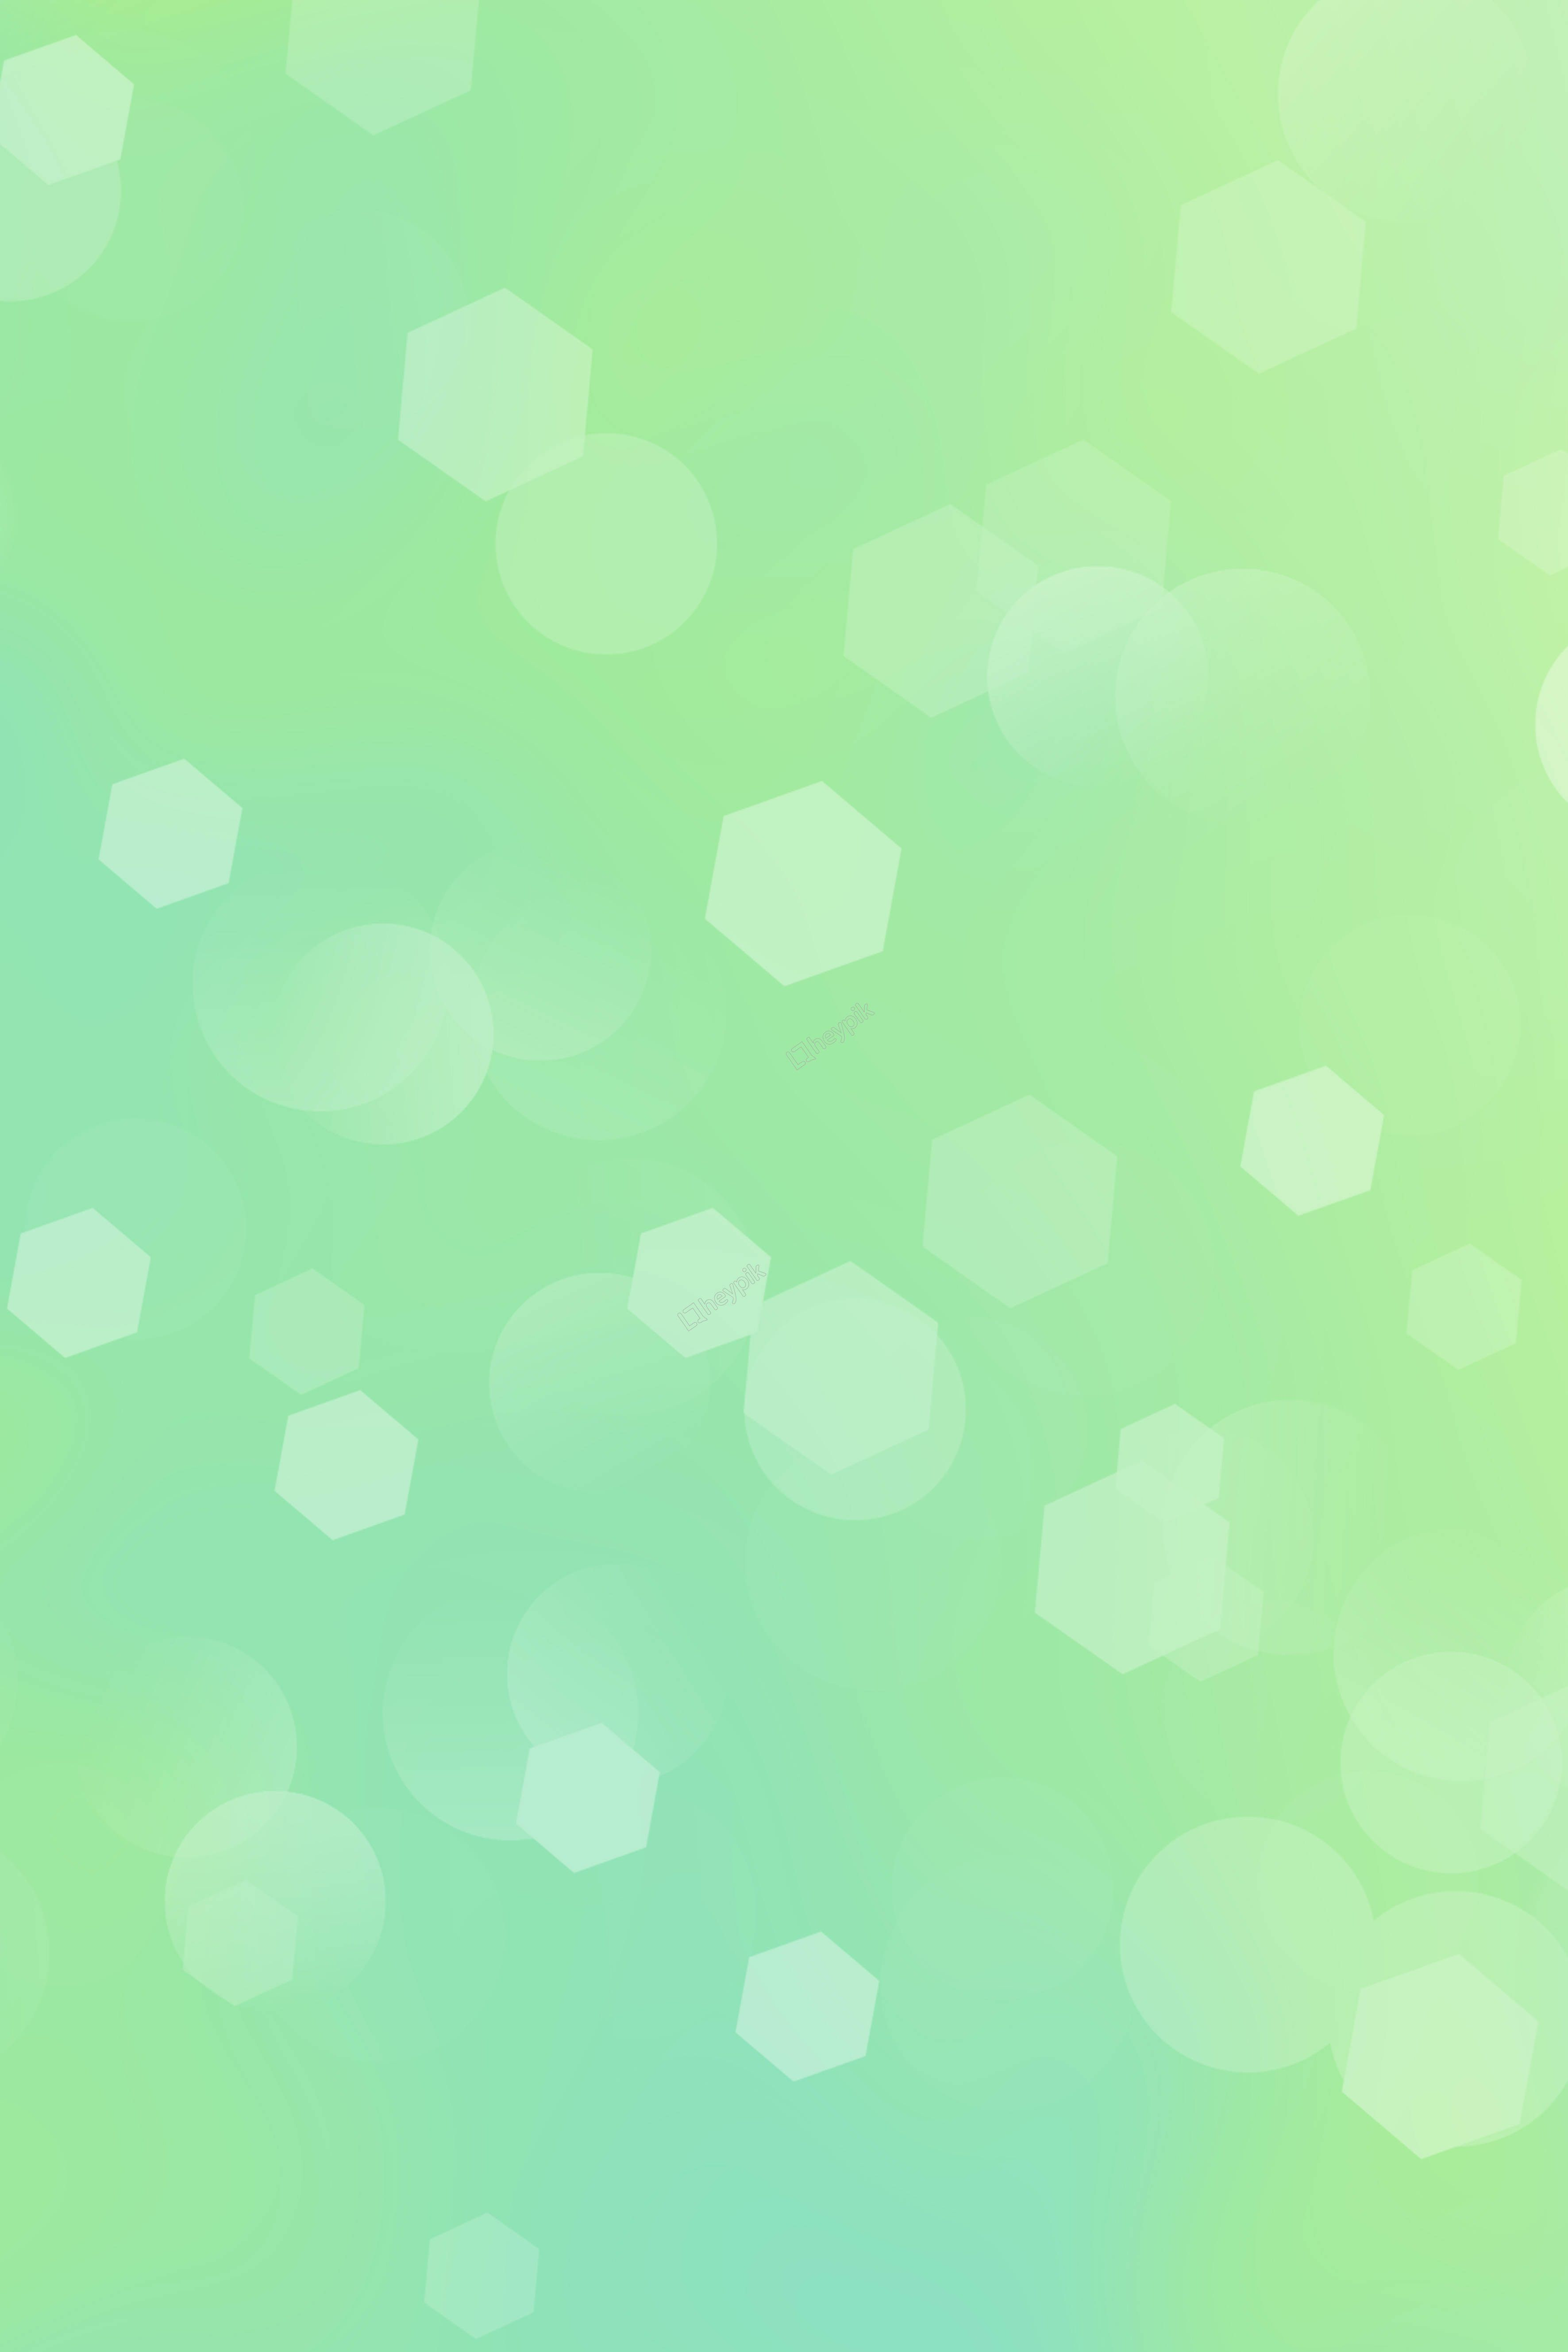 Green Beautiful Geometric Flat Gradient Background